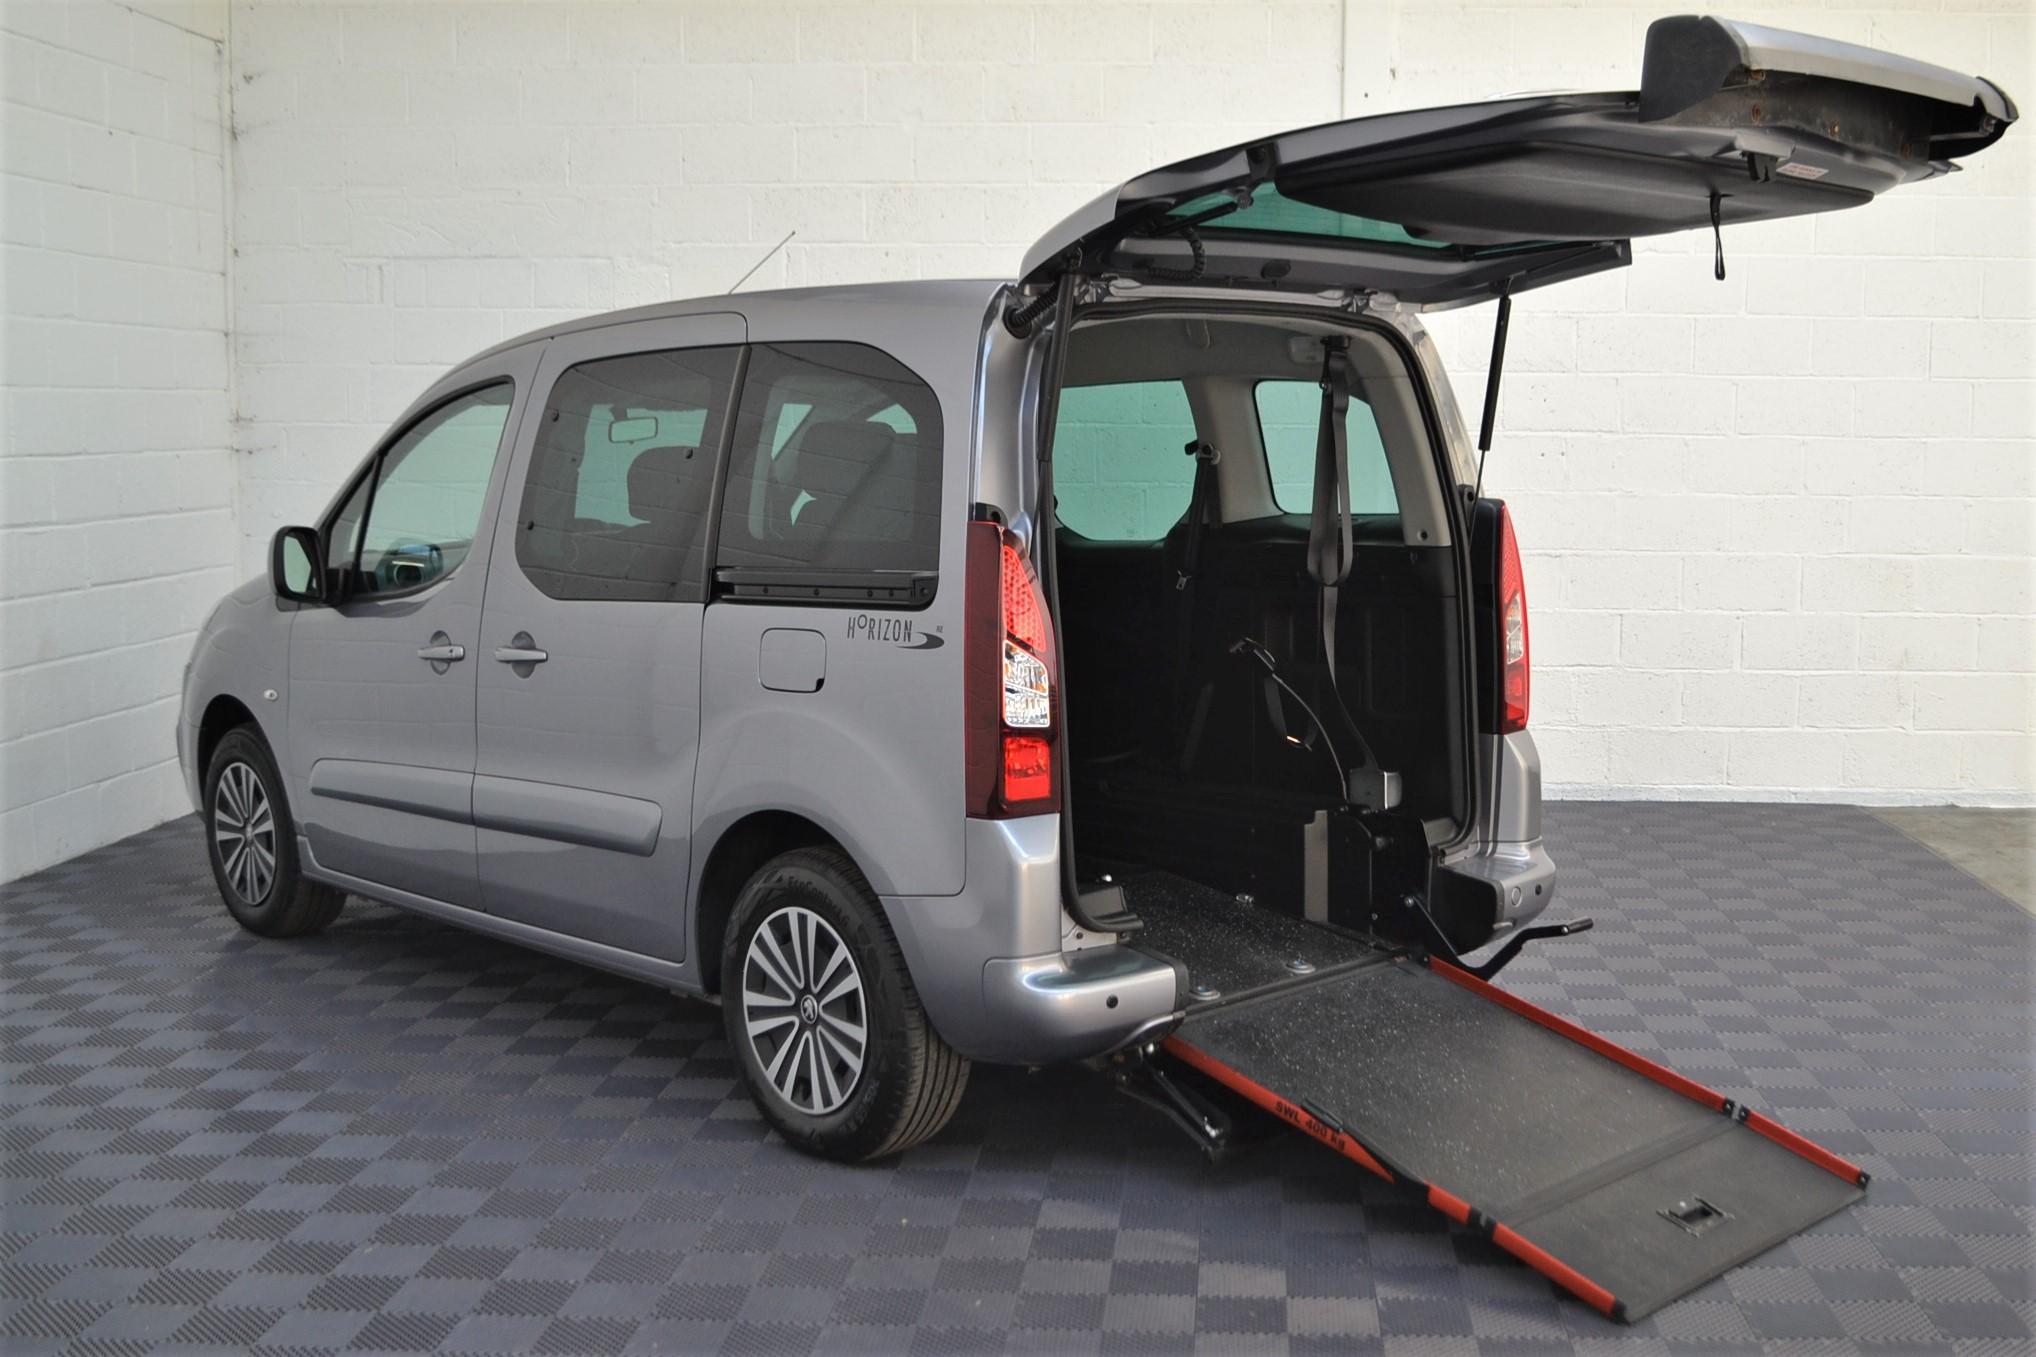 WAV Cars For Sale Bristol Wheelchair Accessible Vehicles Used For Sale Somerset Devon Dorset Bath Peugeot Partner SD17 OZL 8